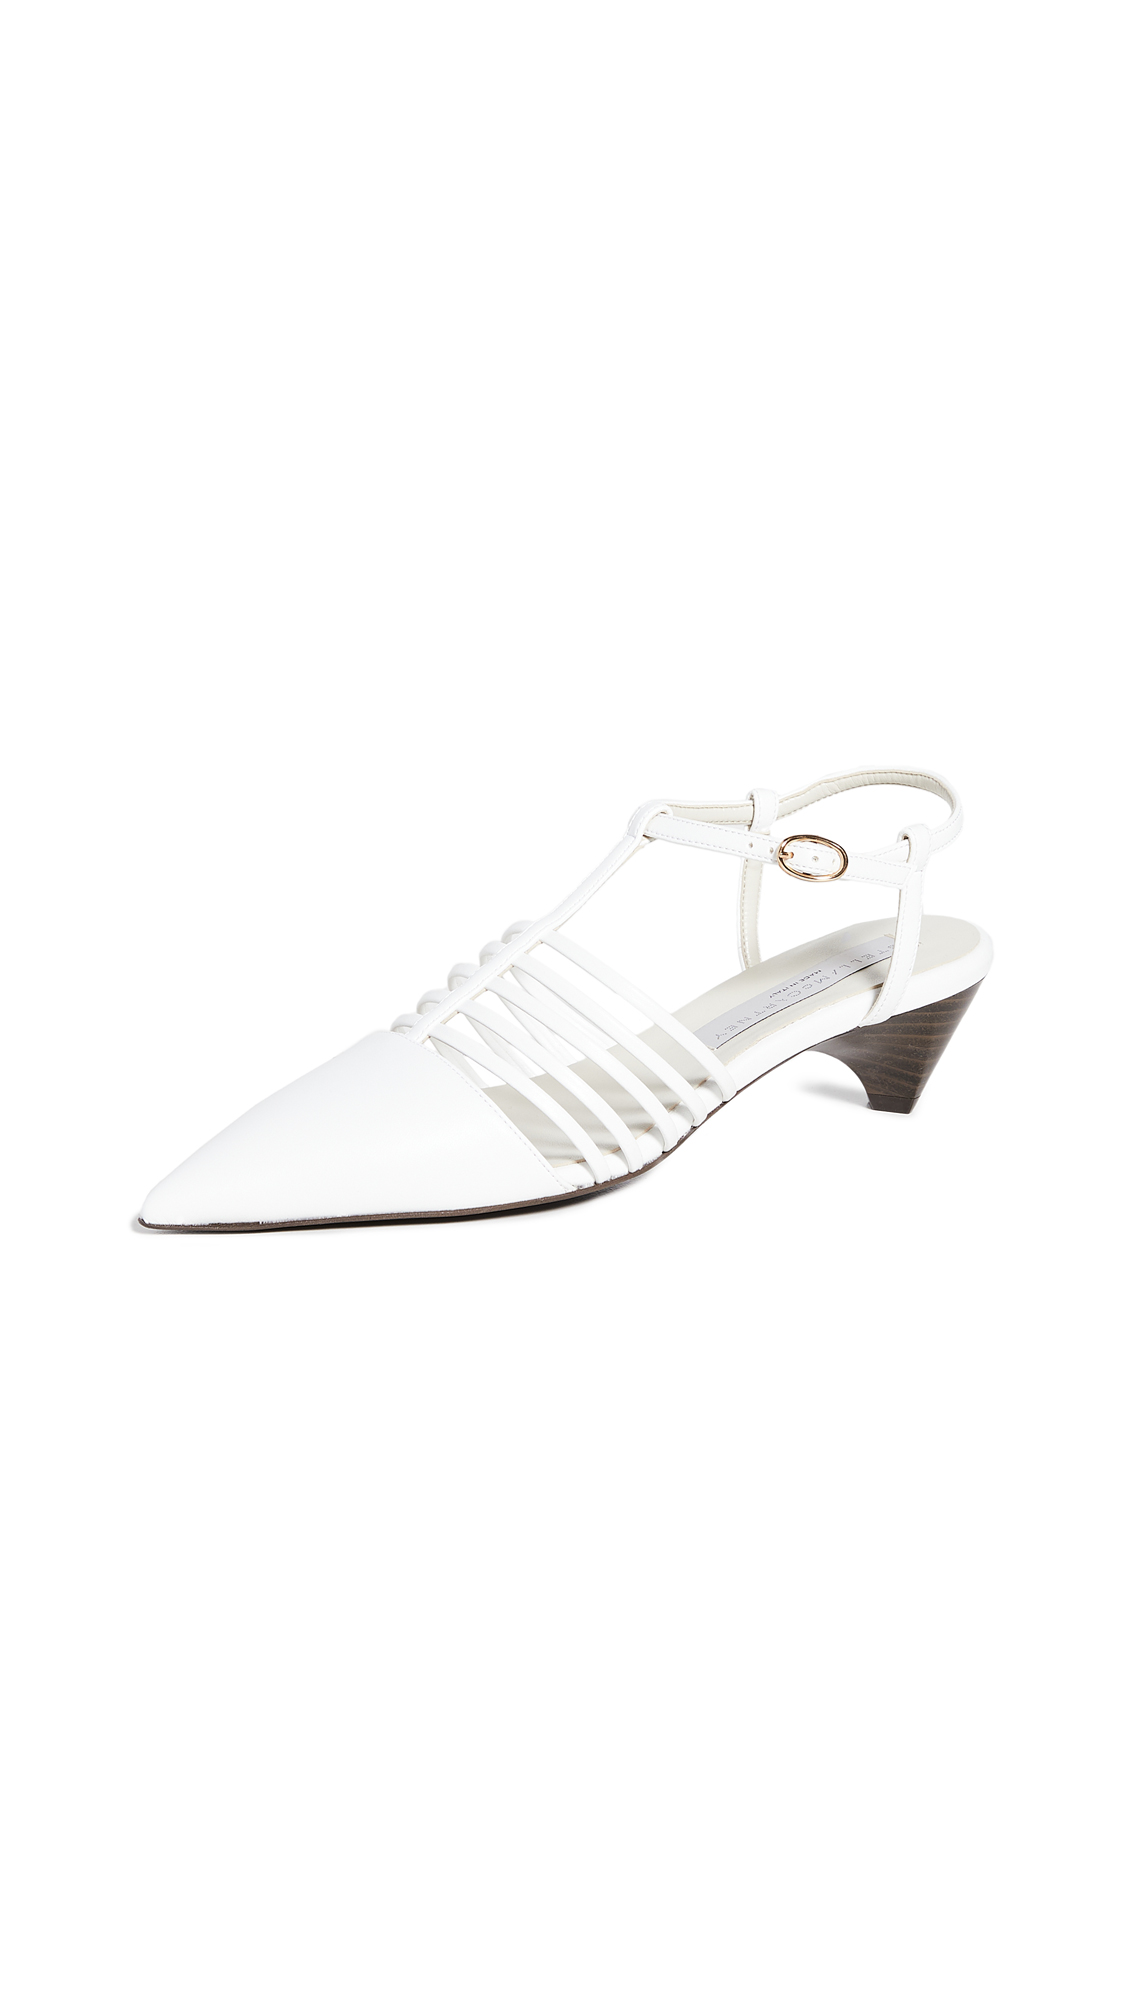 Stella McCartney Mid Heel Sandals